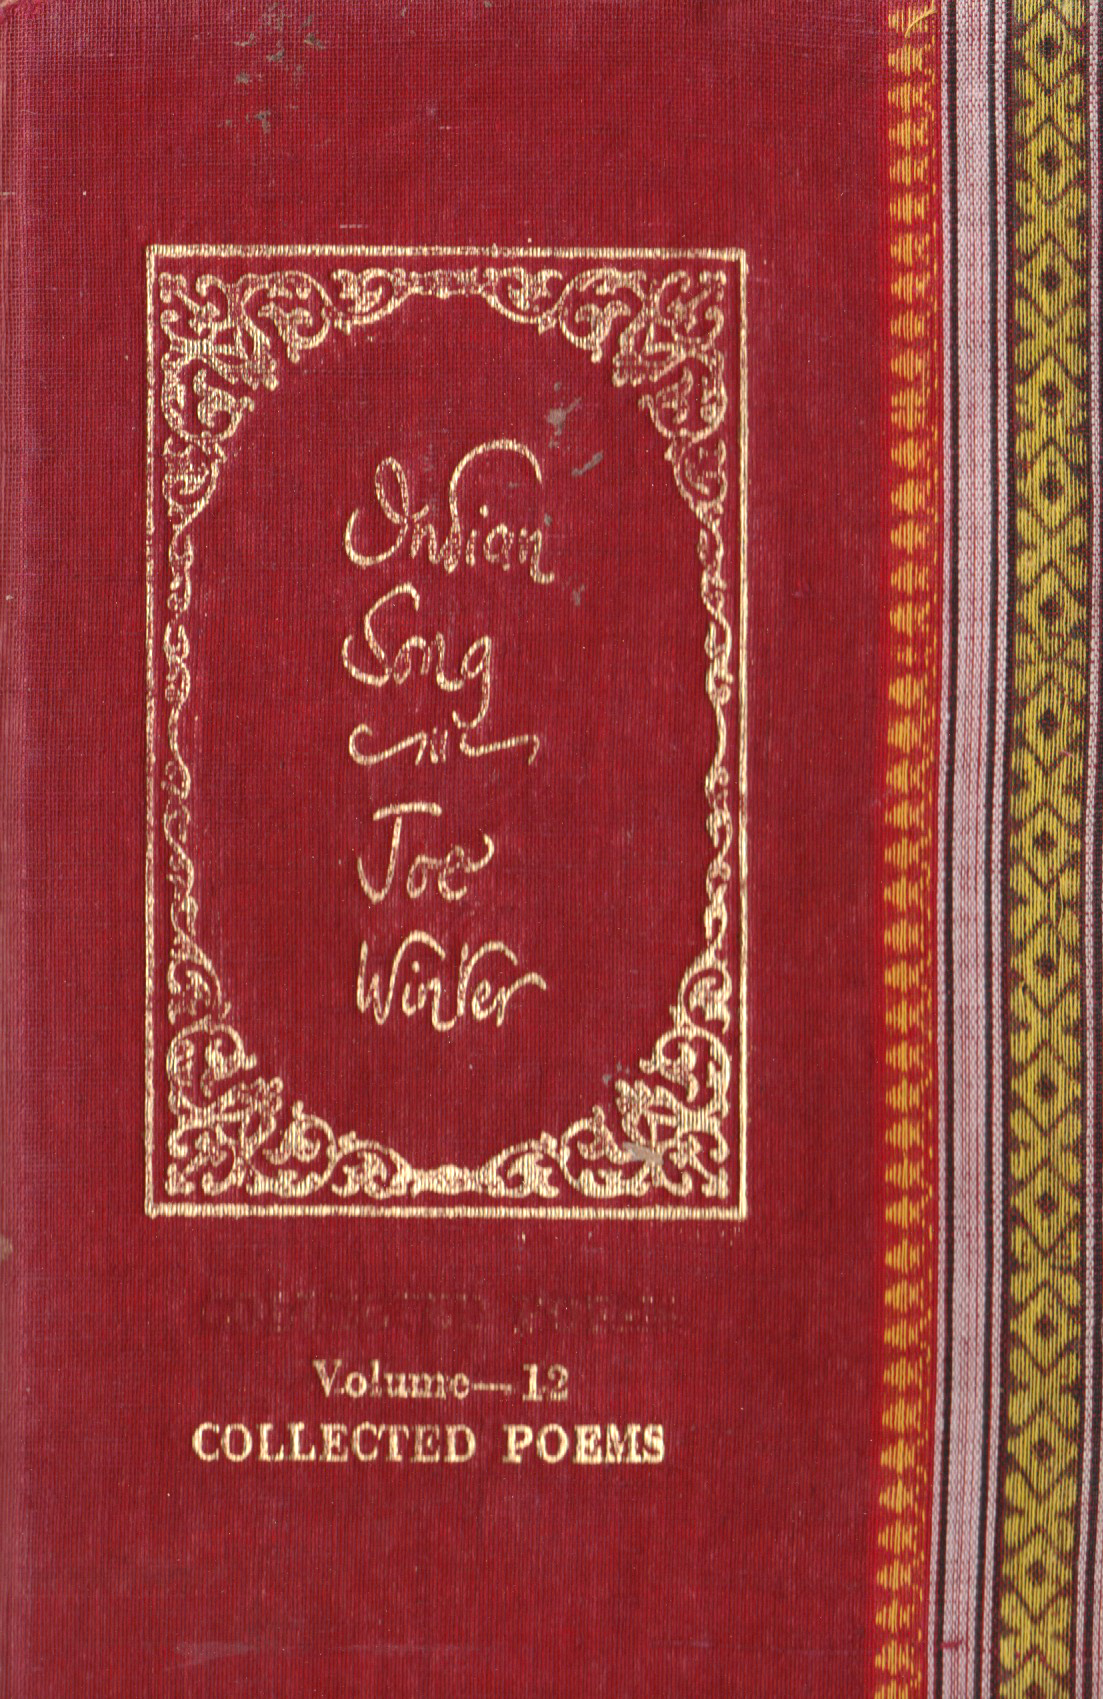 Joe Winter Poetry, Indian Song